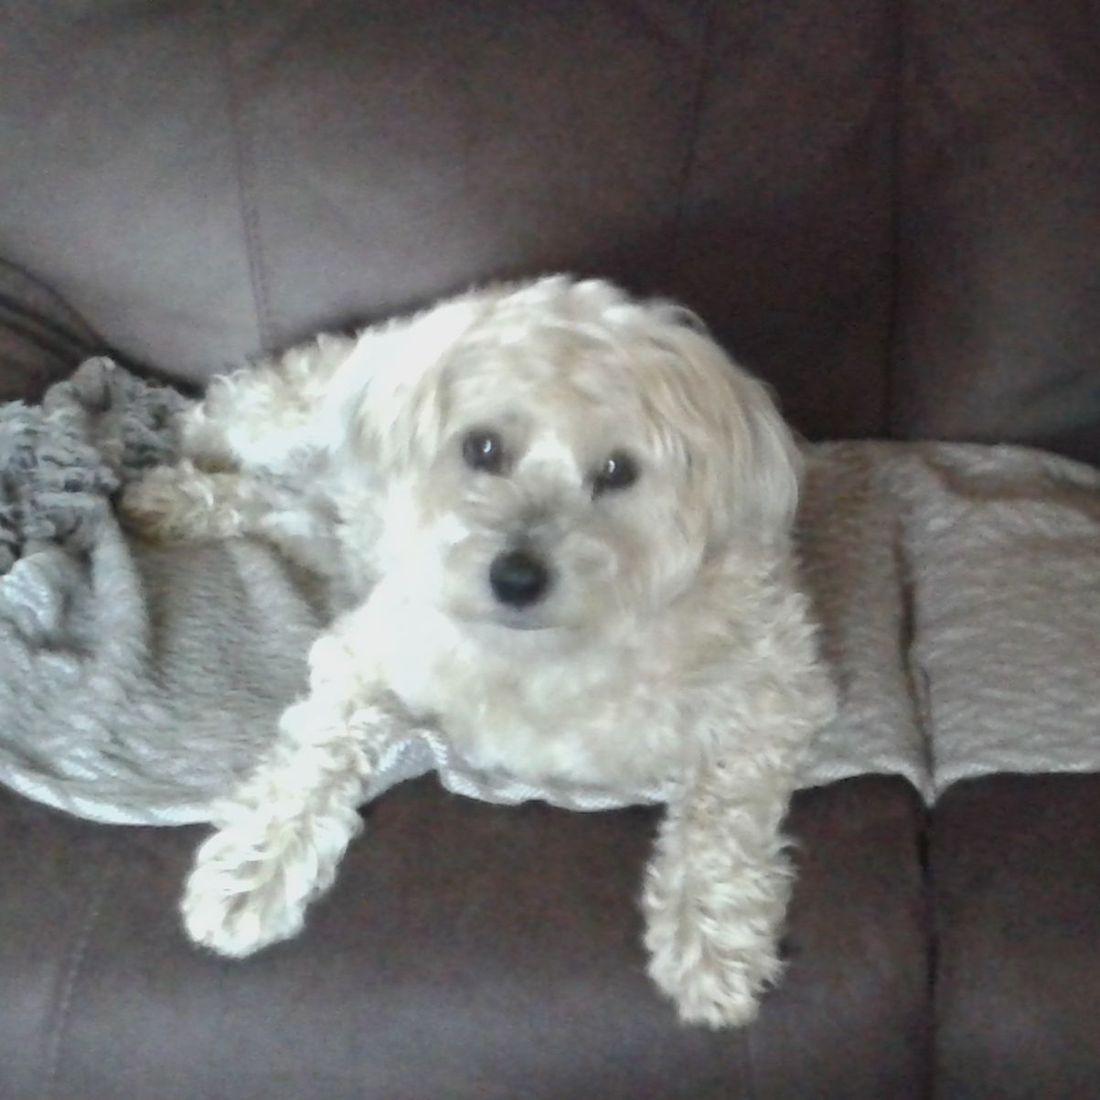 Cute dog on sofa